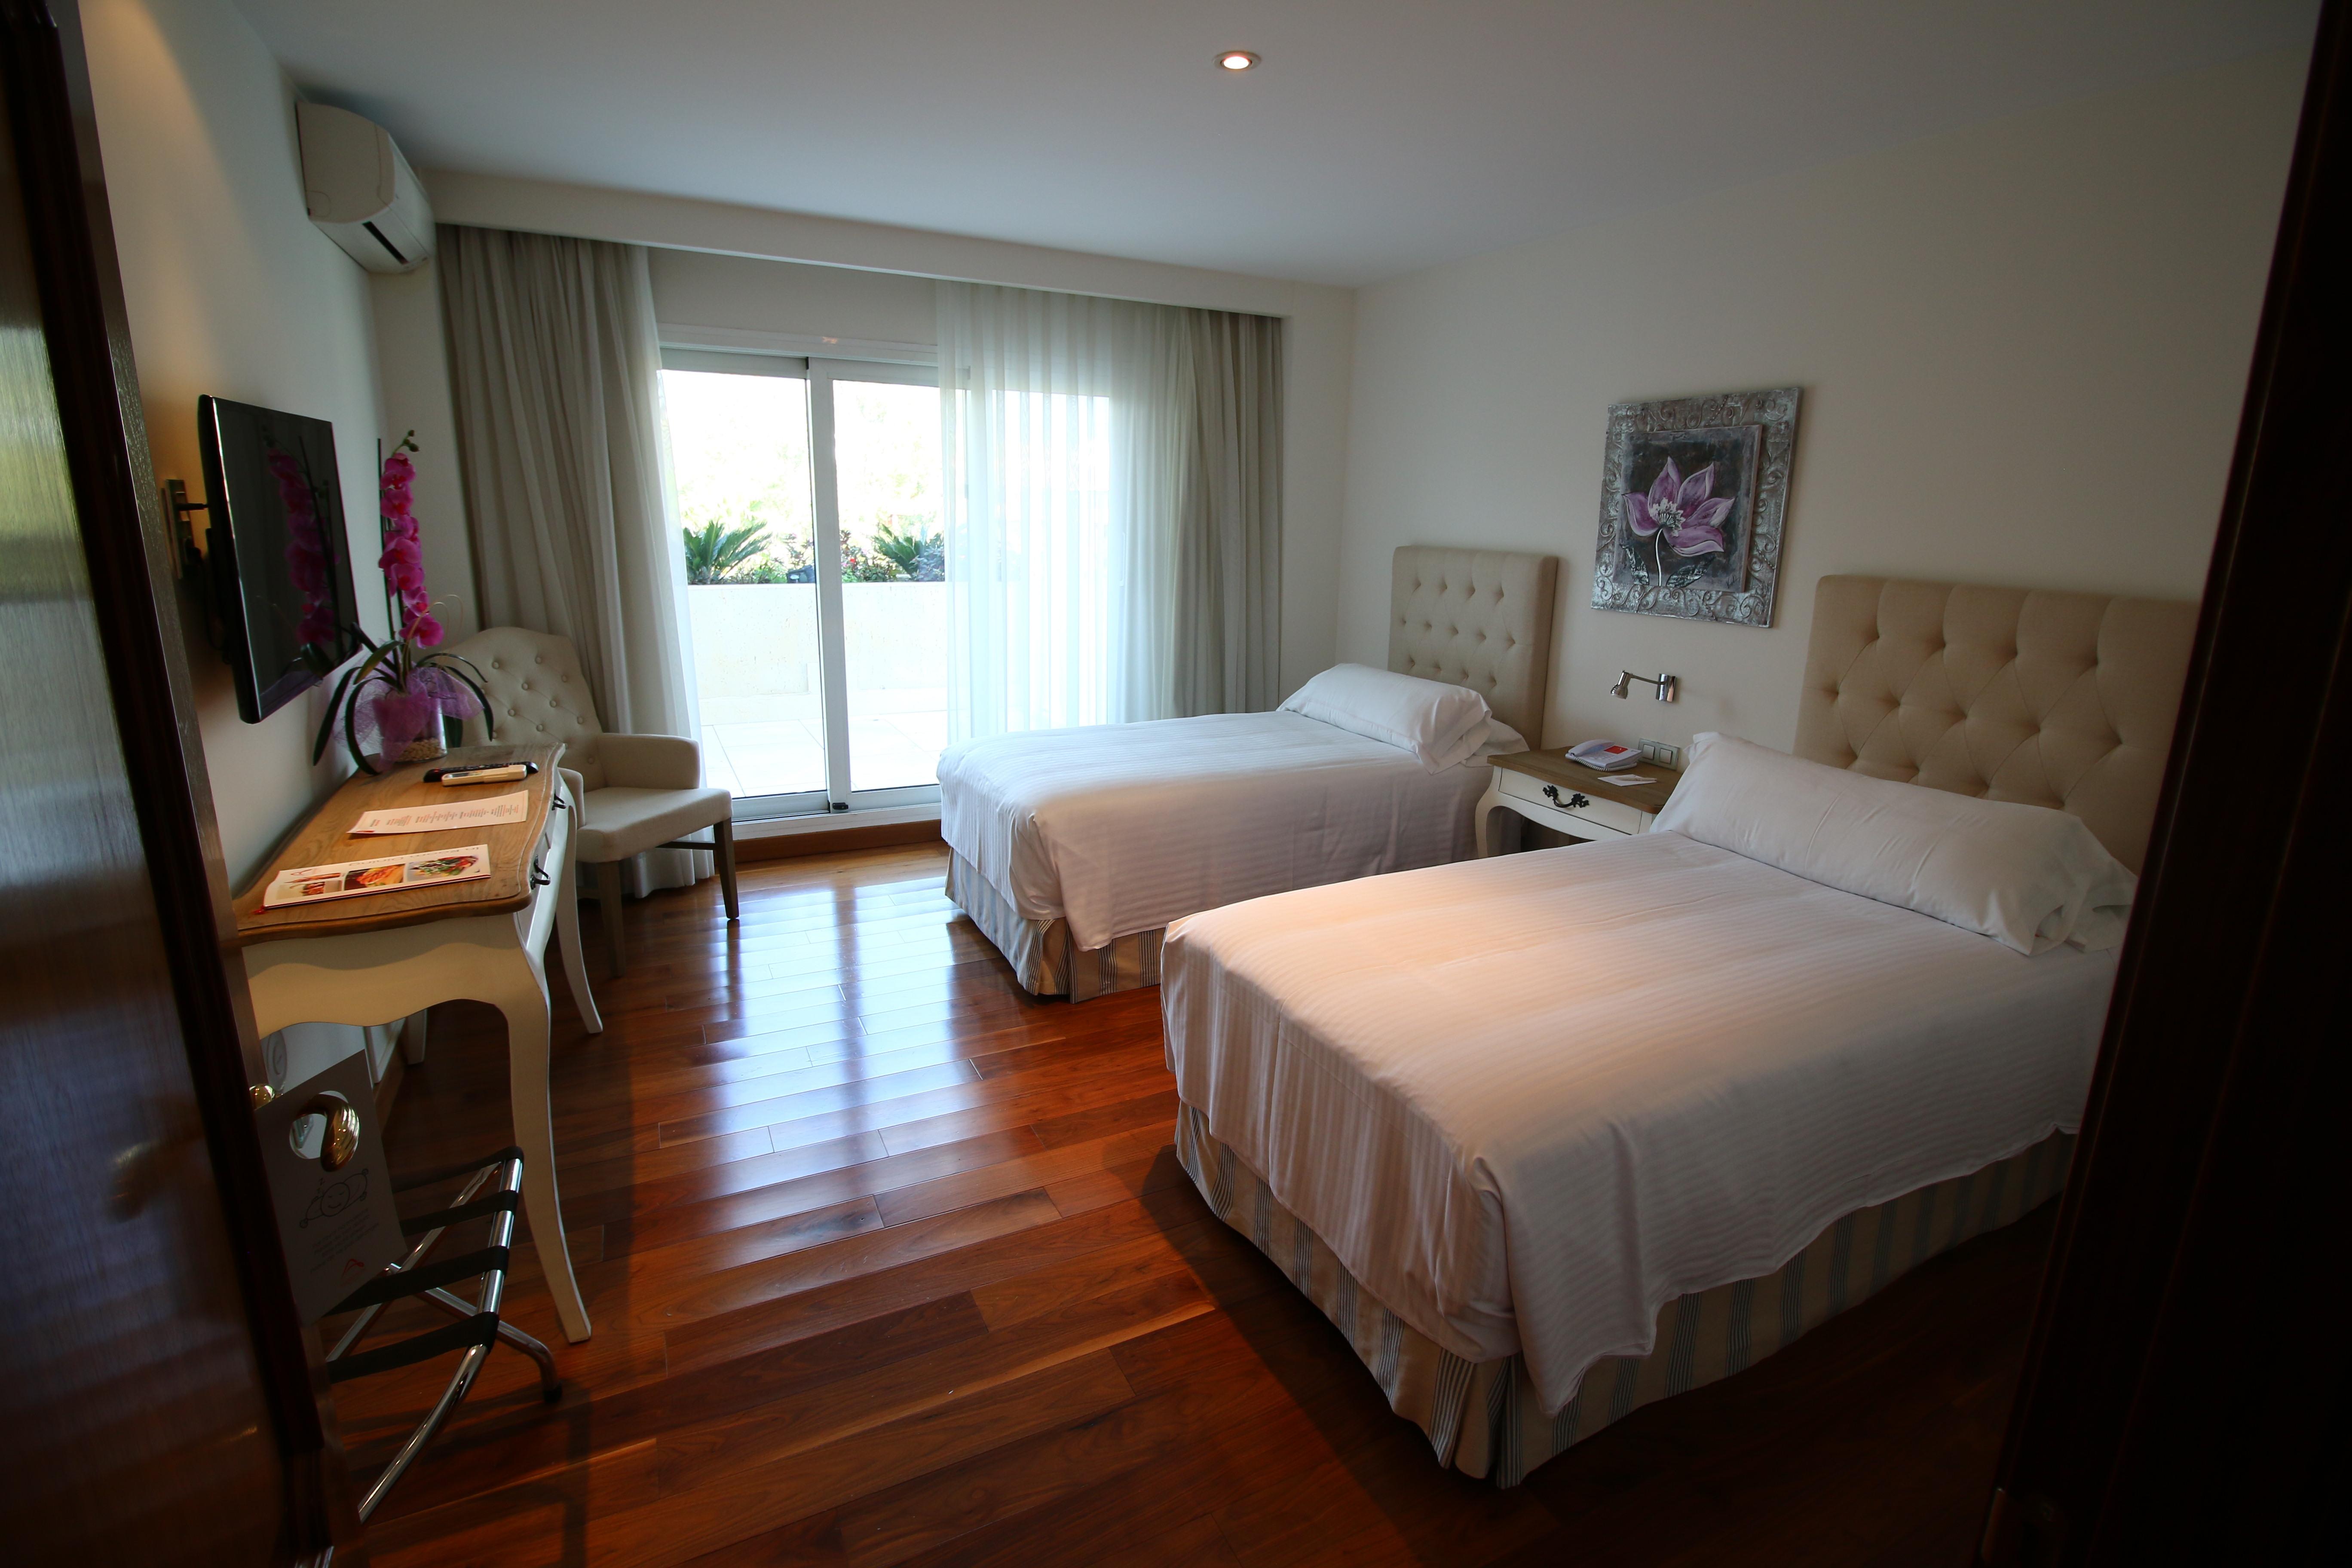 Real Suite 4 bedrooms